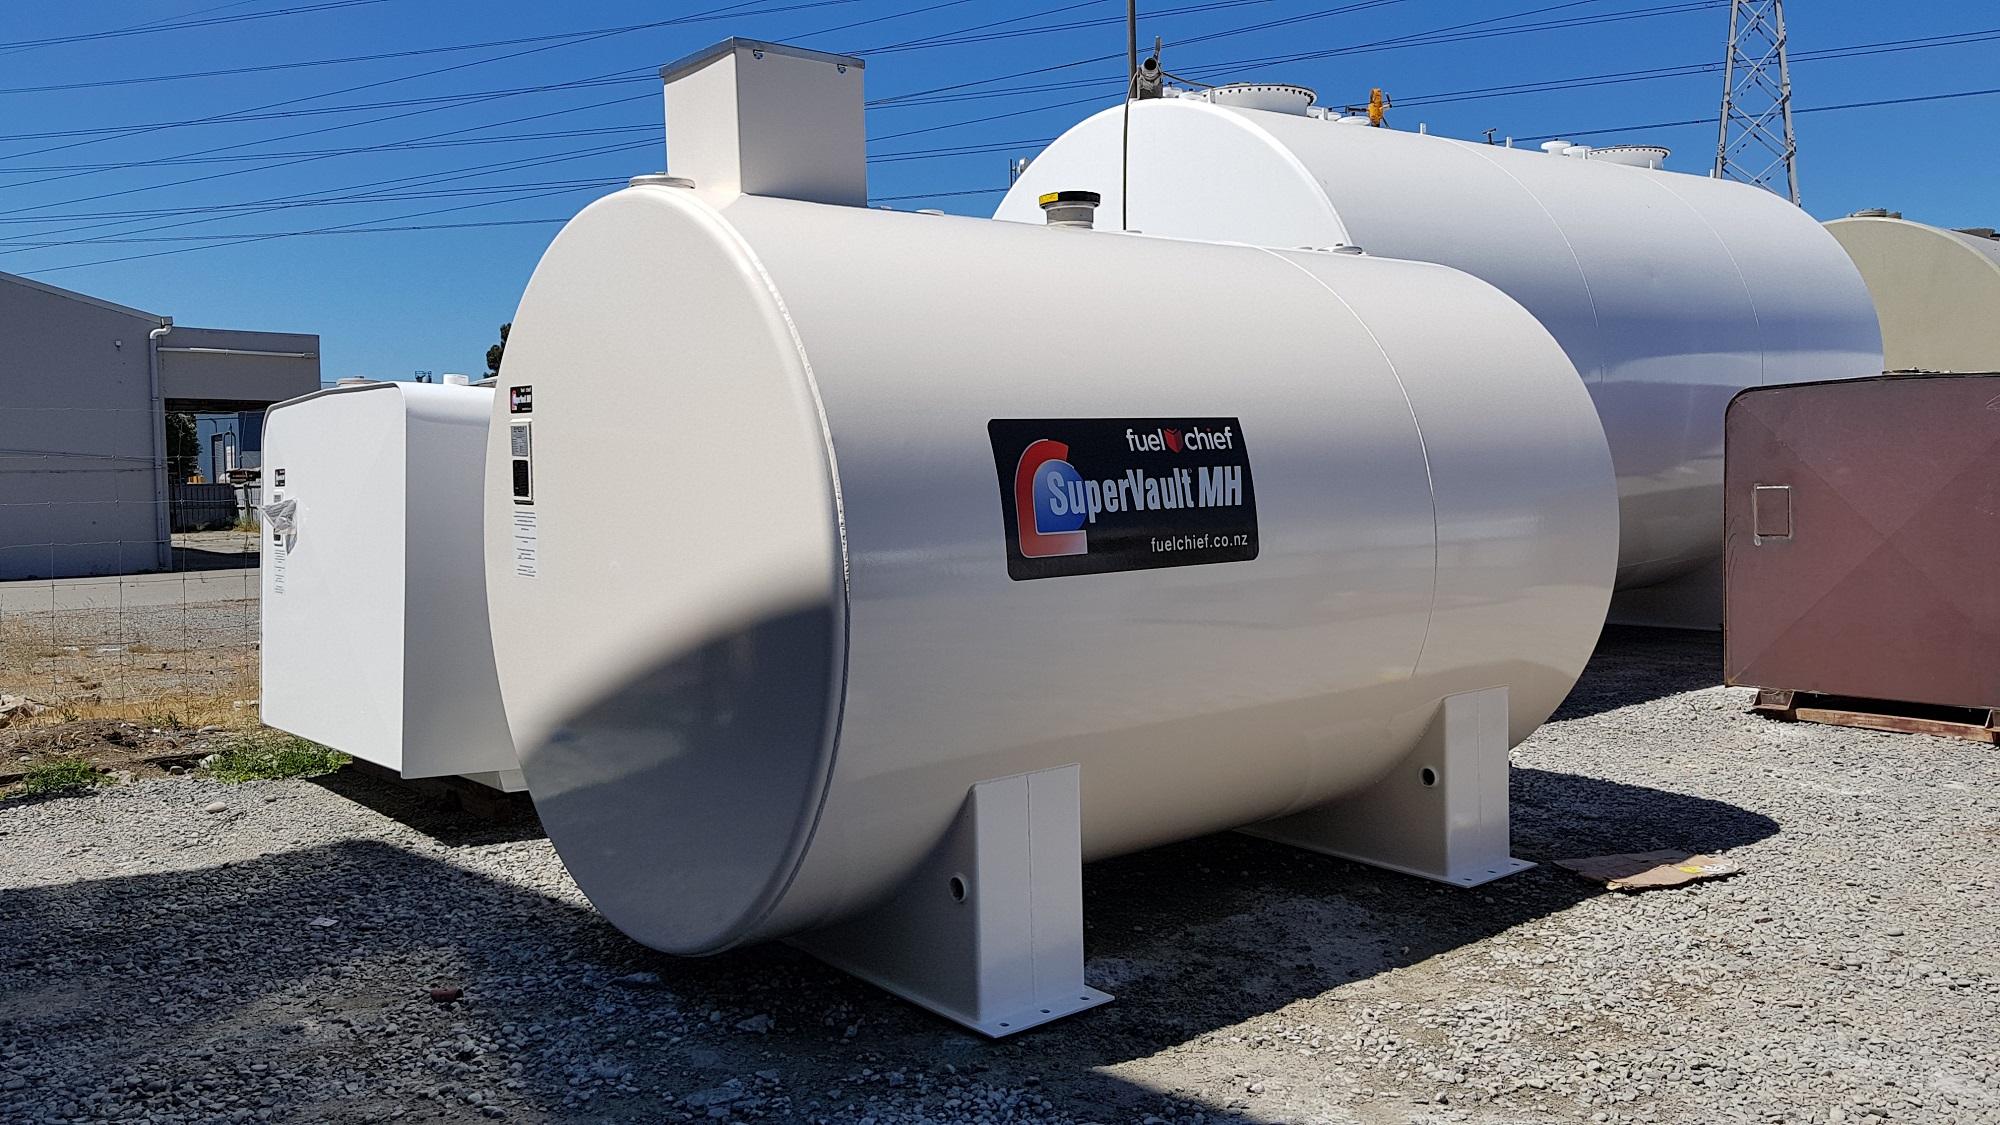 Supervault Mh Fuel Tank Aviation Tanks Fuel Storage